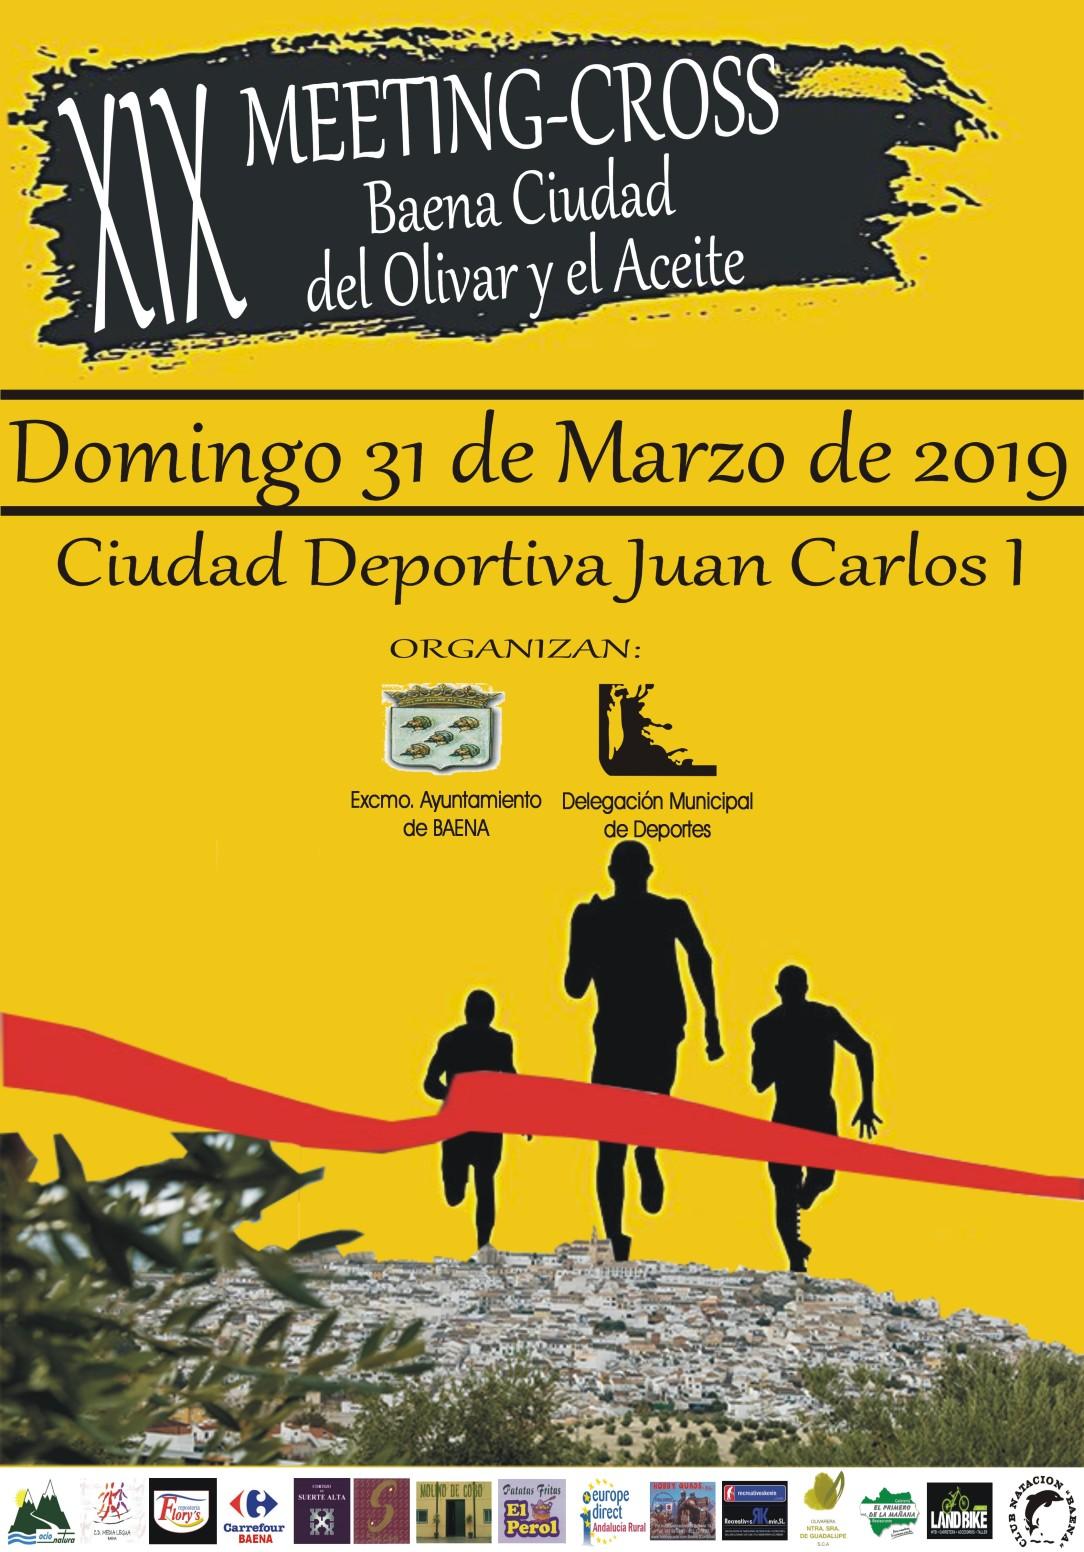 MEETING 2019 corregido